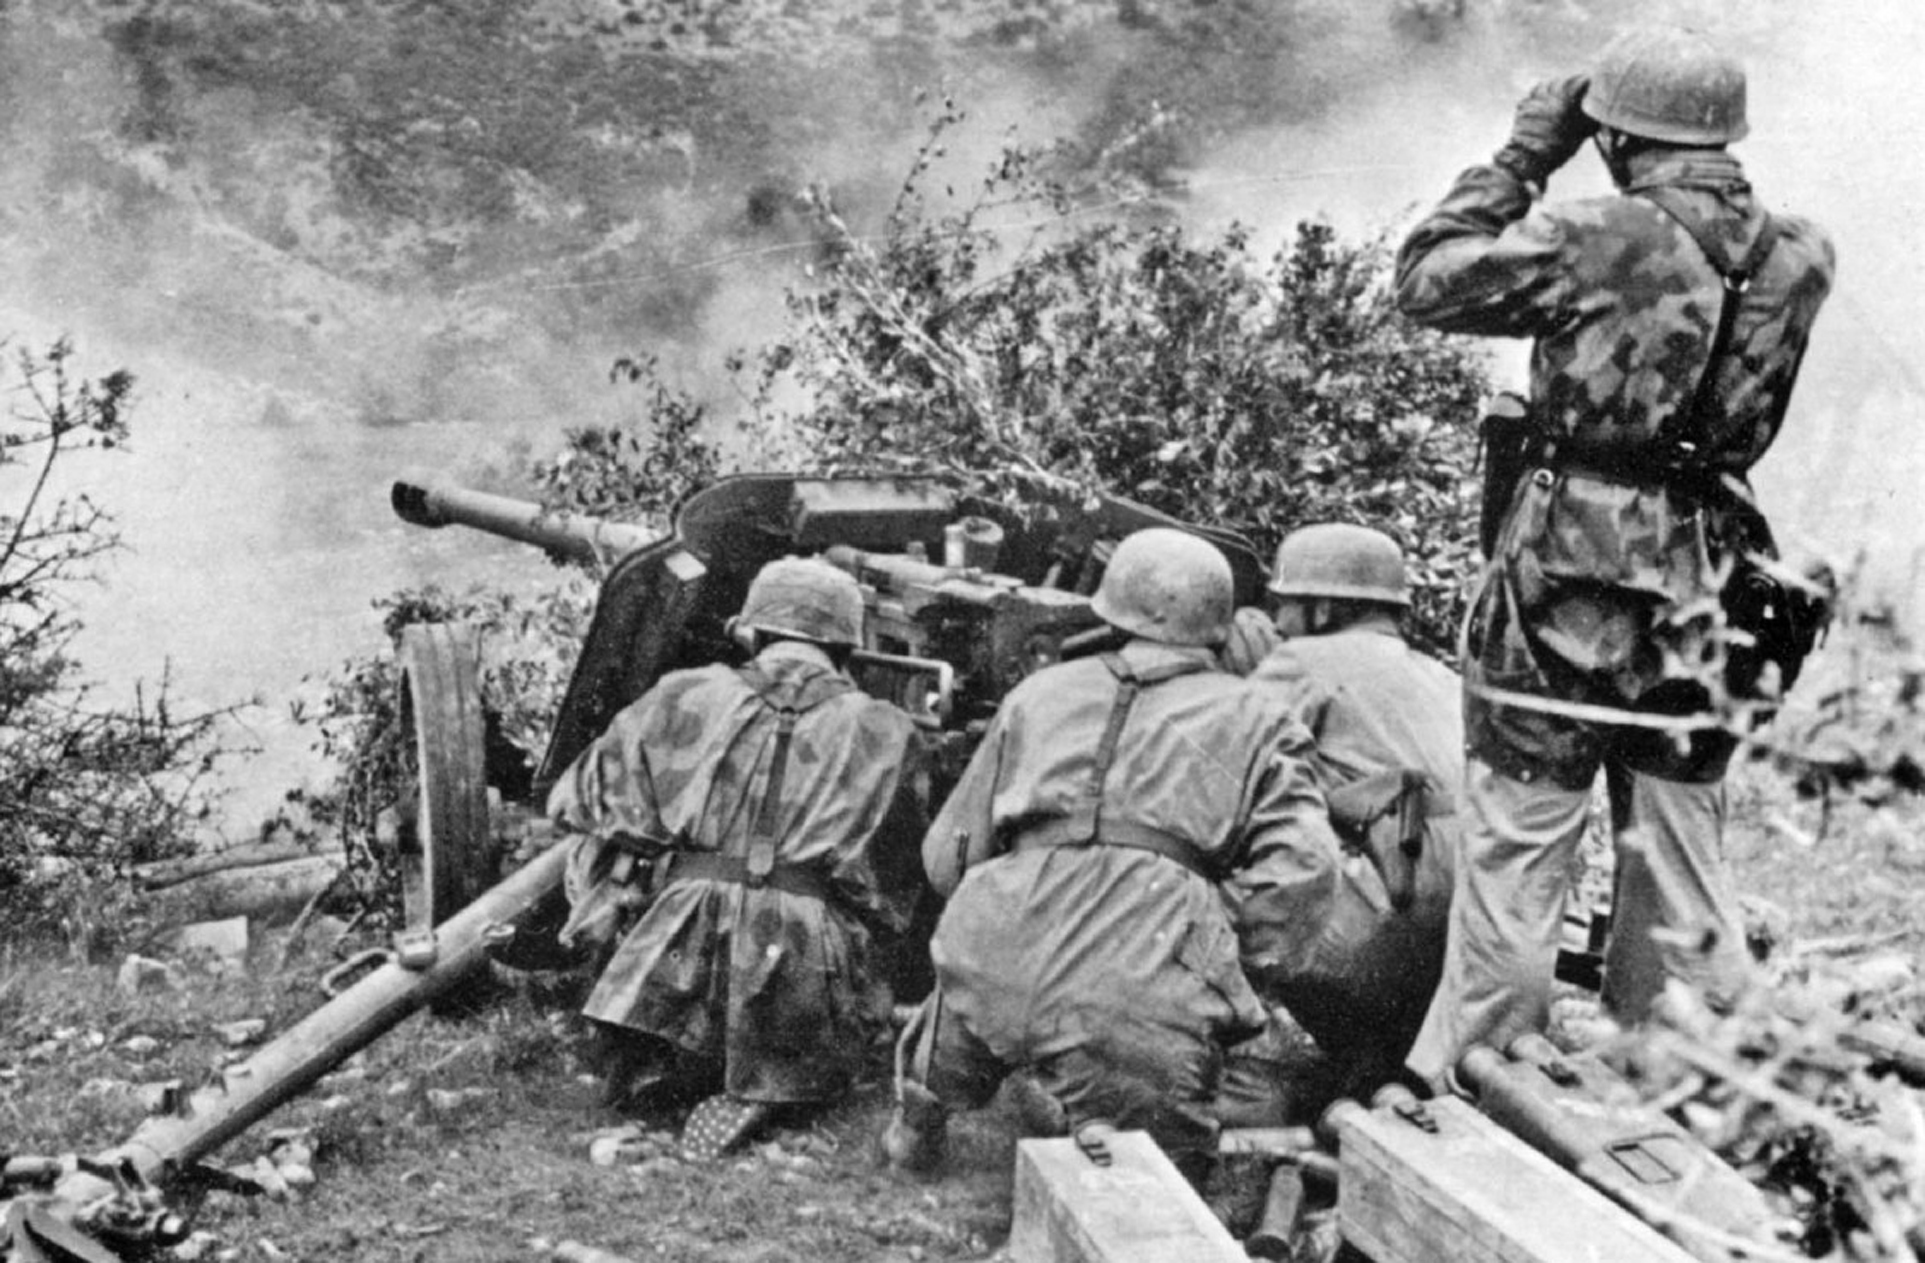 soldiers Warfare history World War II wallpaper background 1925x1263